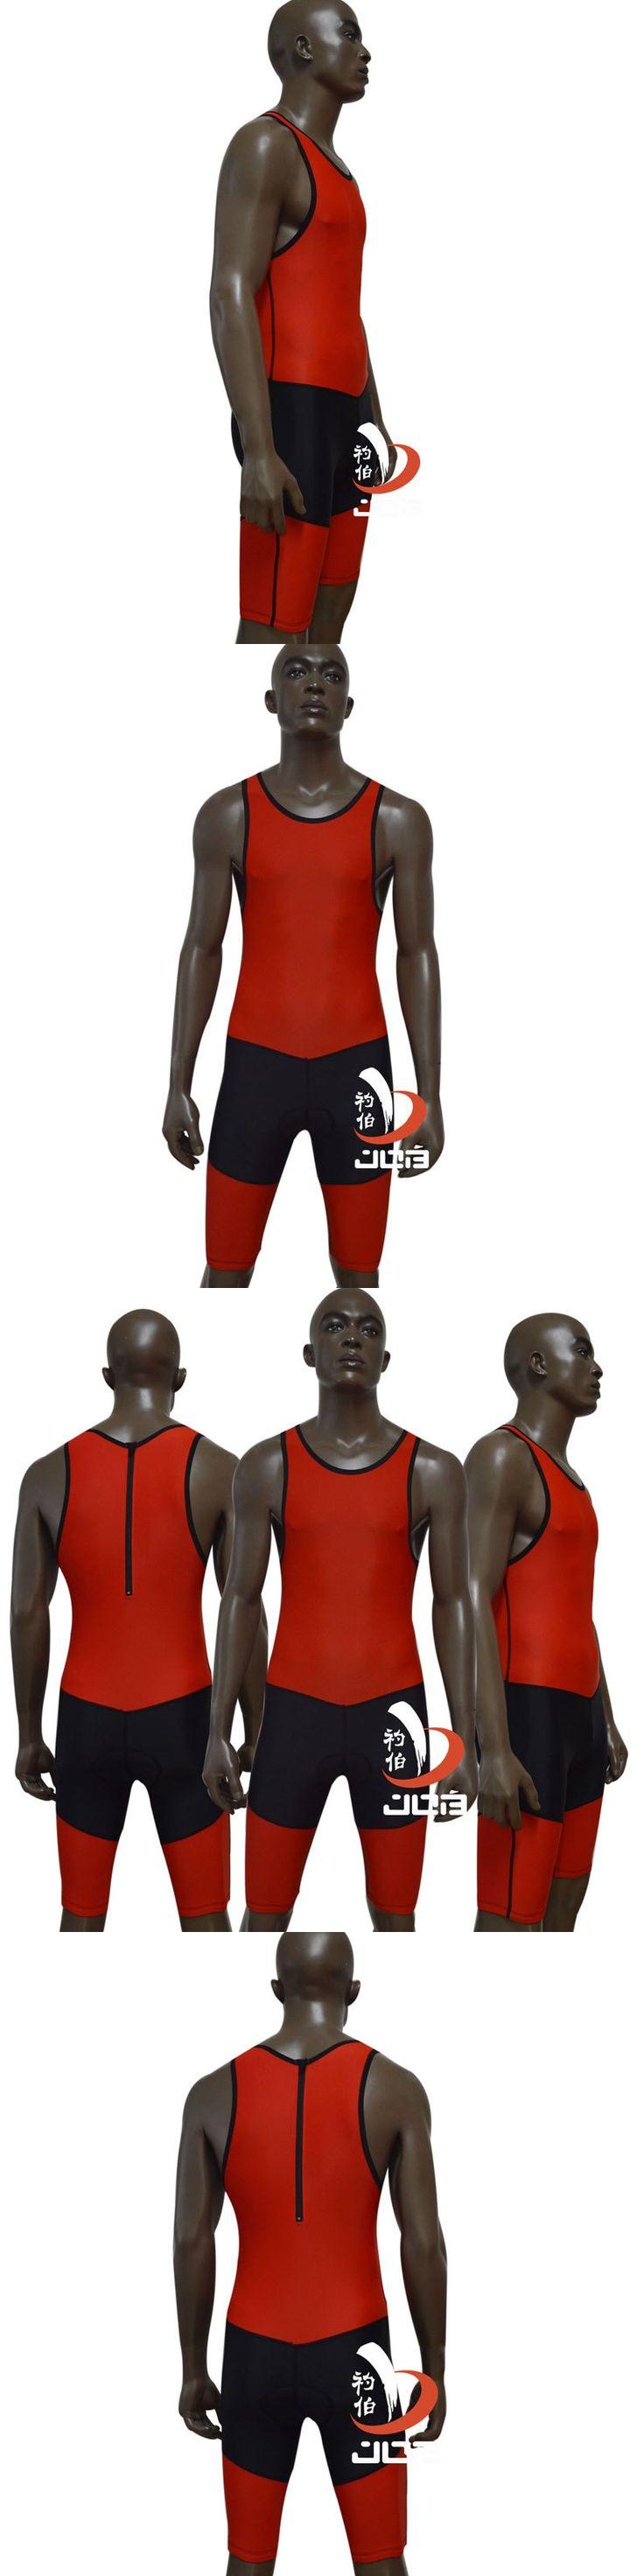 Hot Sale! New arrivals professional compression Cycling Bike BIcycle Jumpsuit ironman triathlon Clothes swimsuit Tri suit